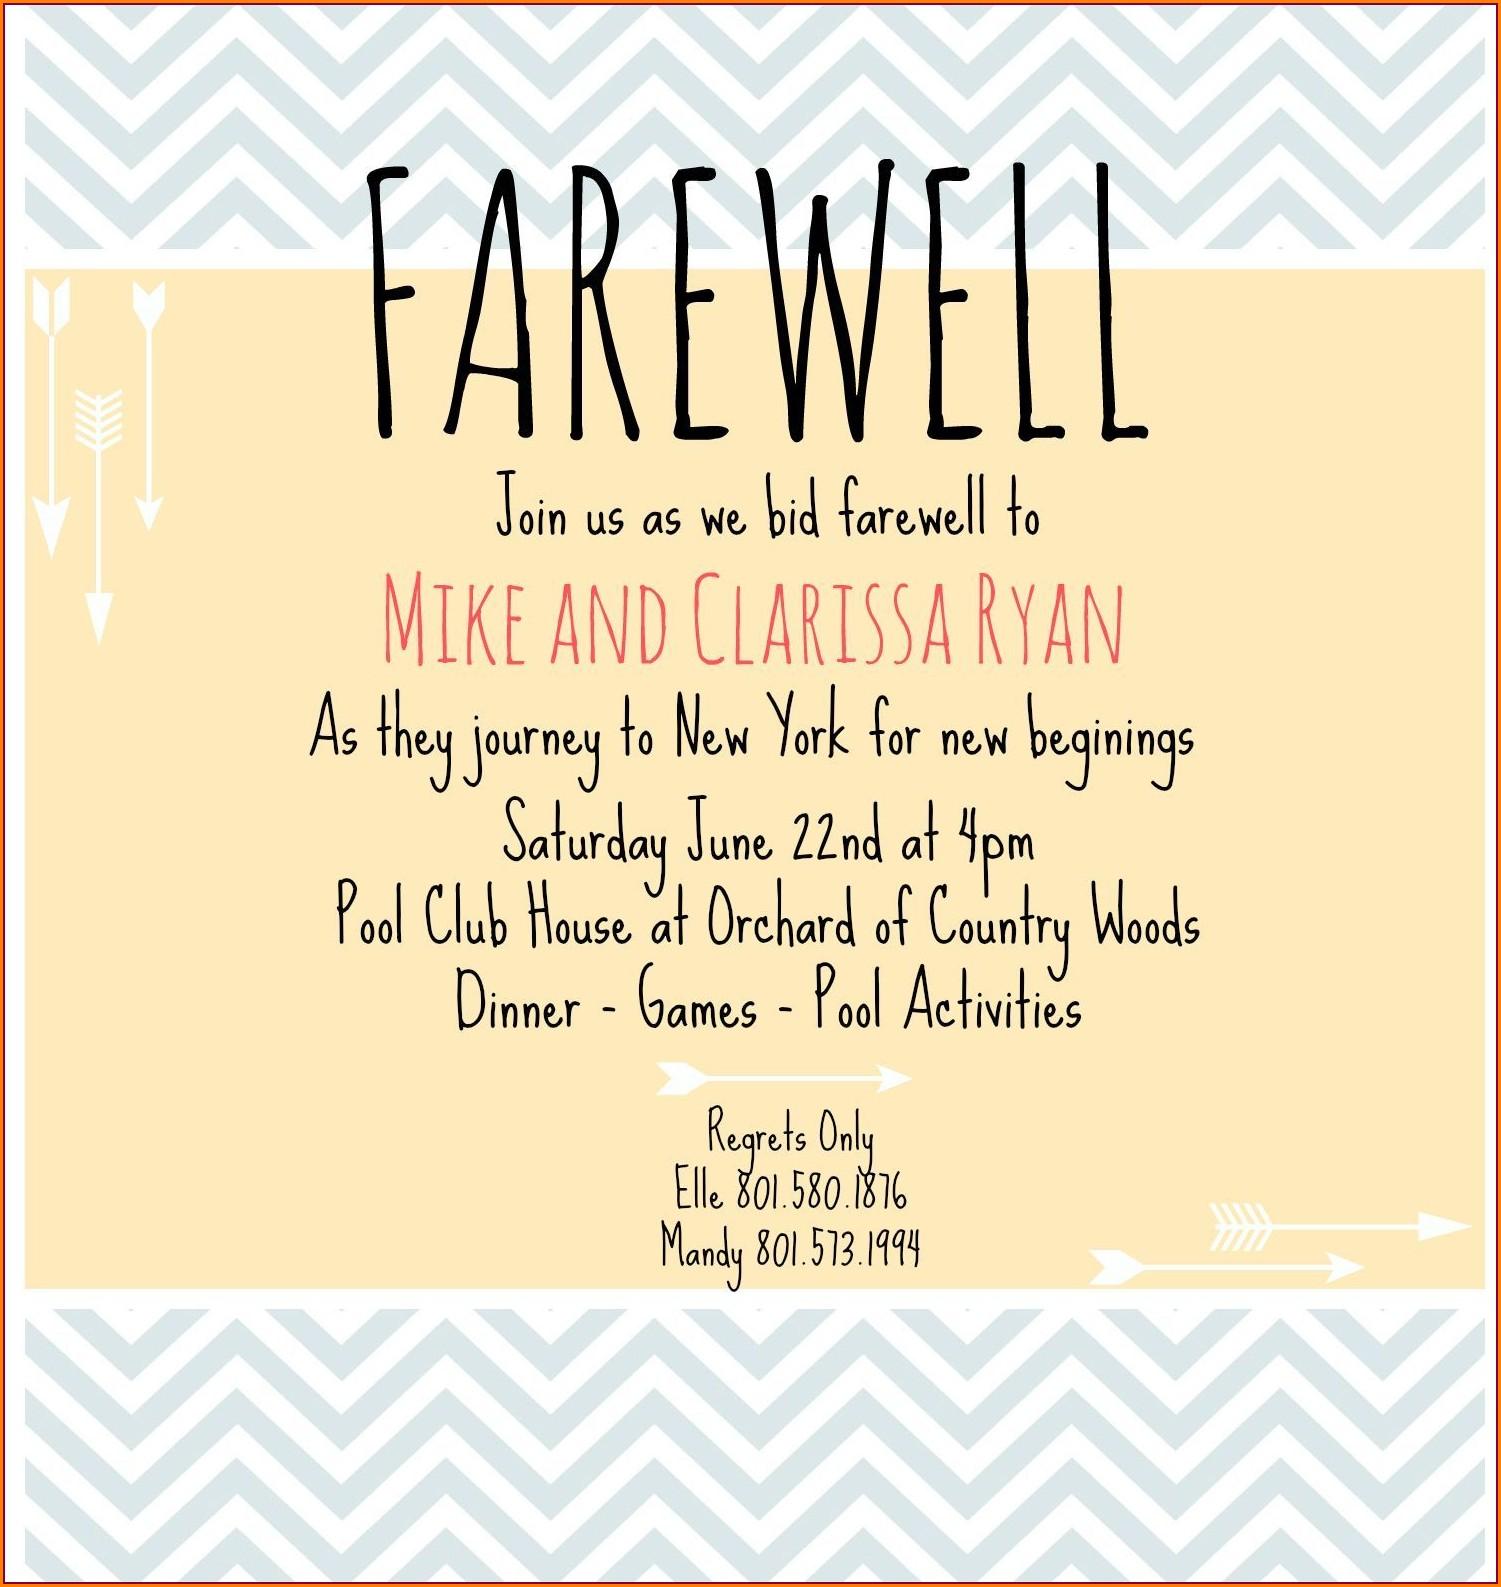 Farewell Lunch Invitation Card